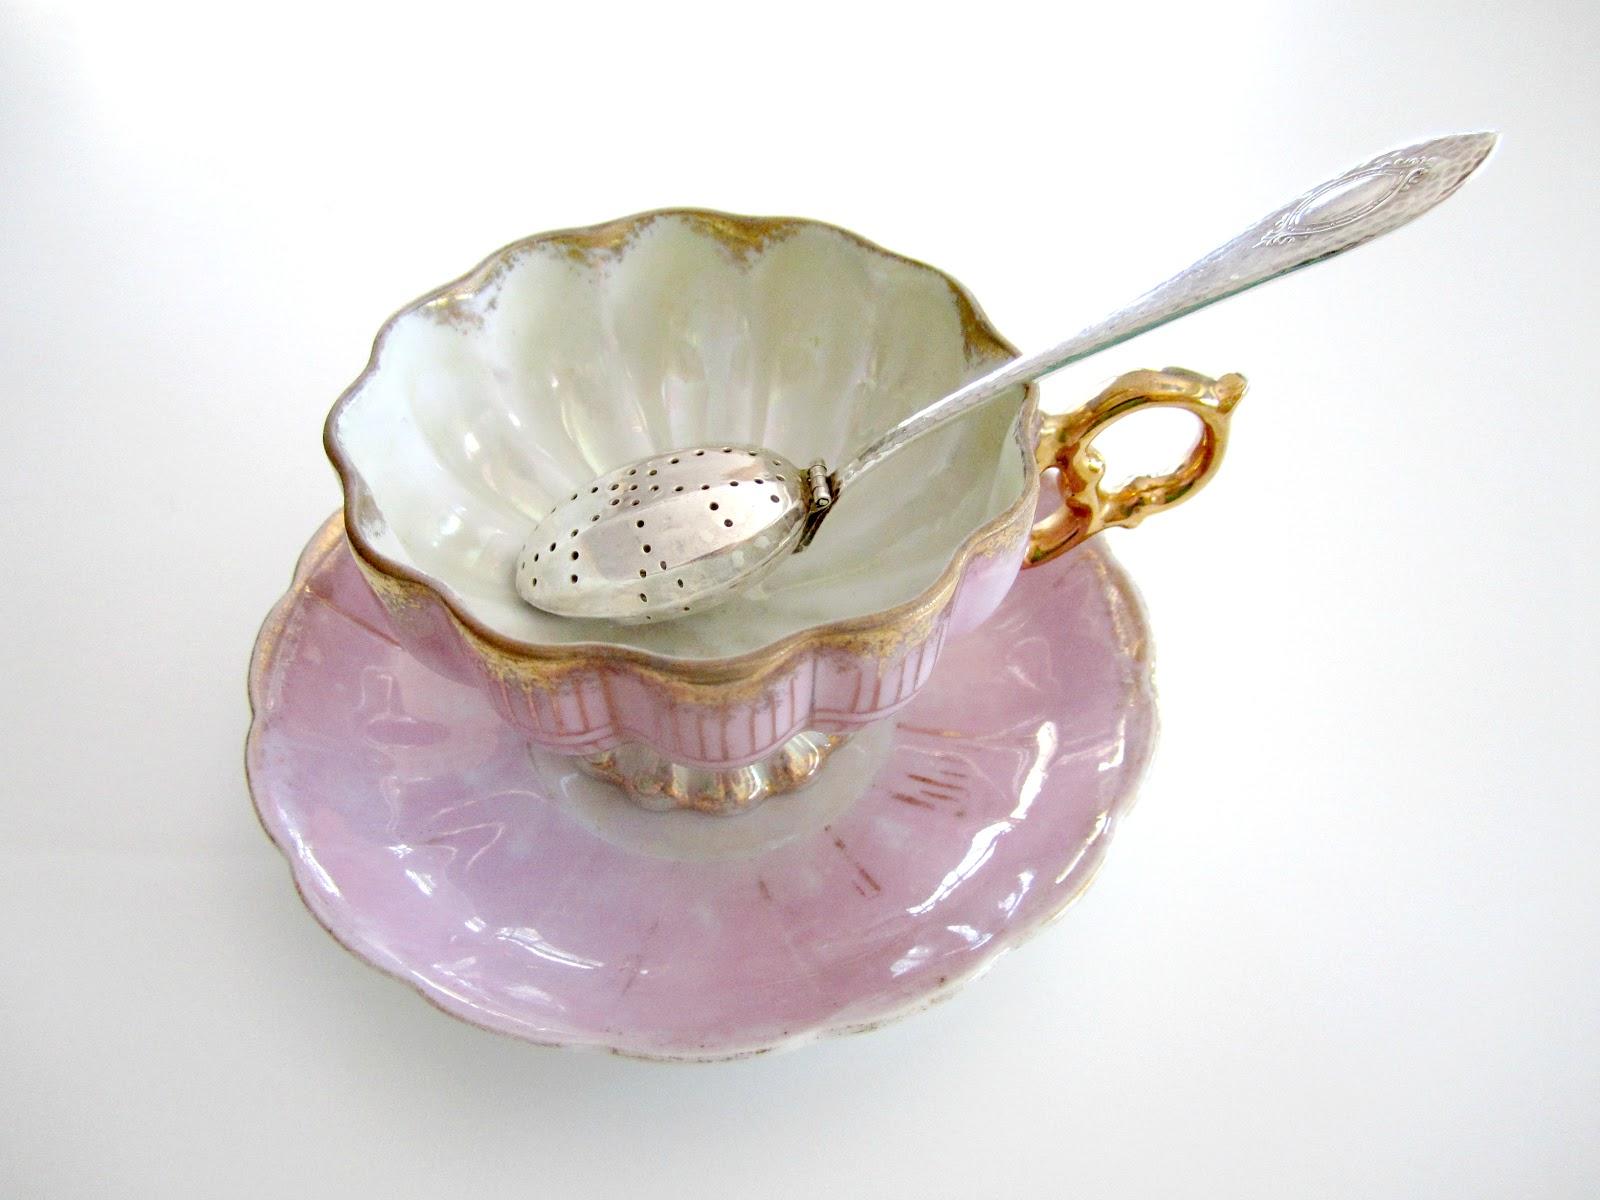 Teaspoon Tea Infuser with Tea Cup